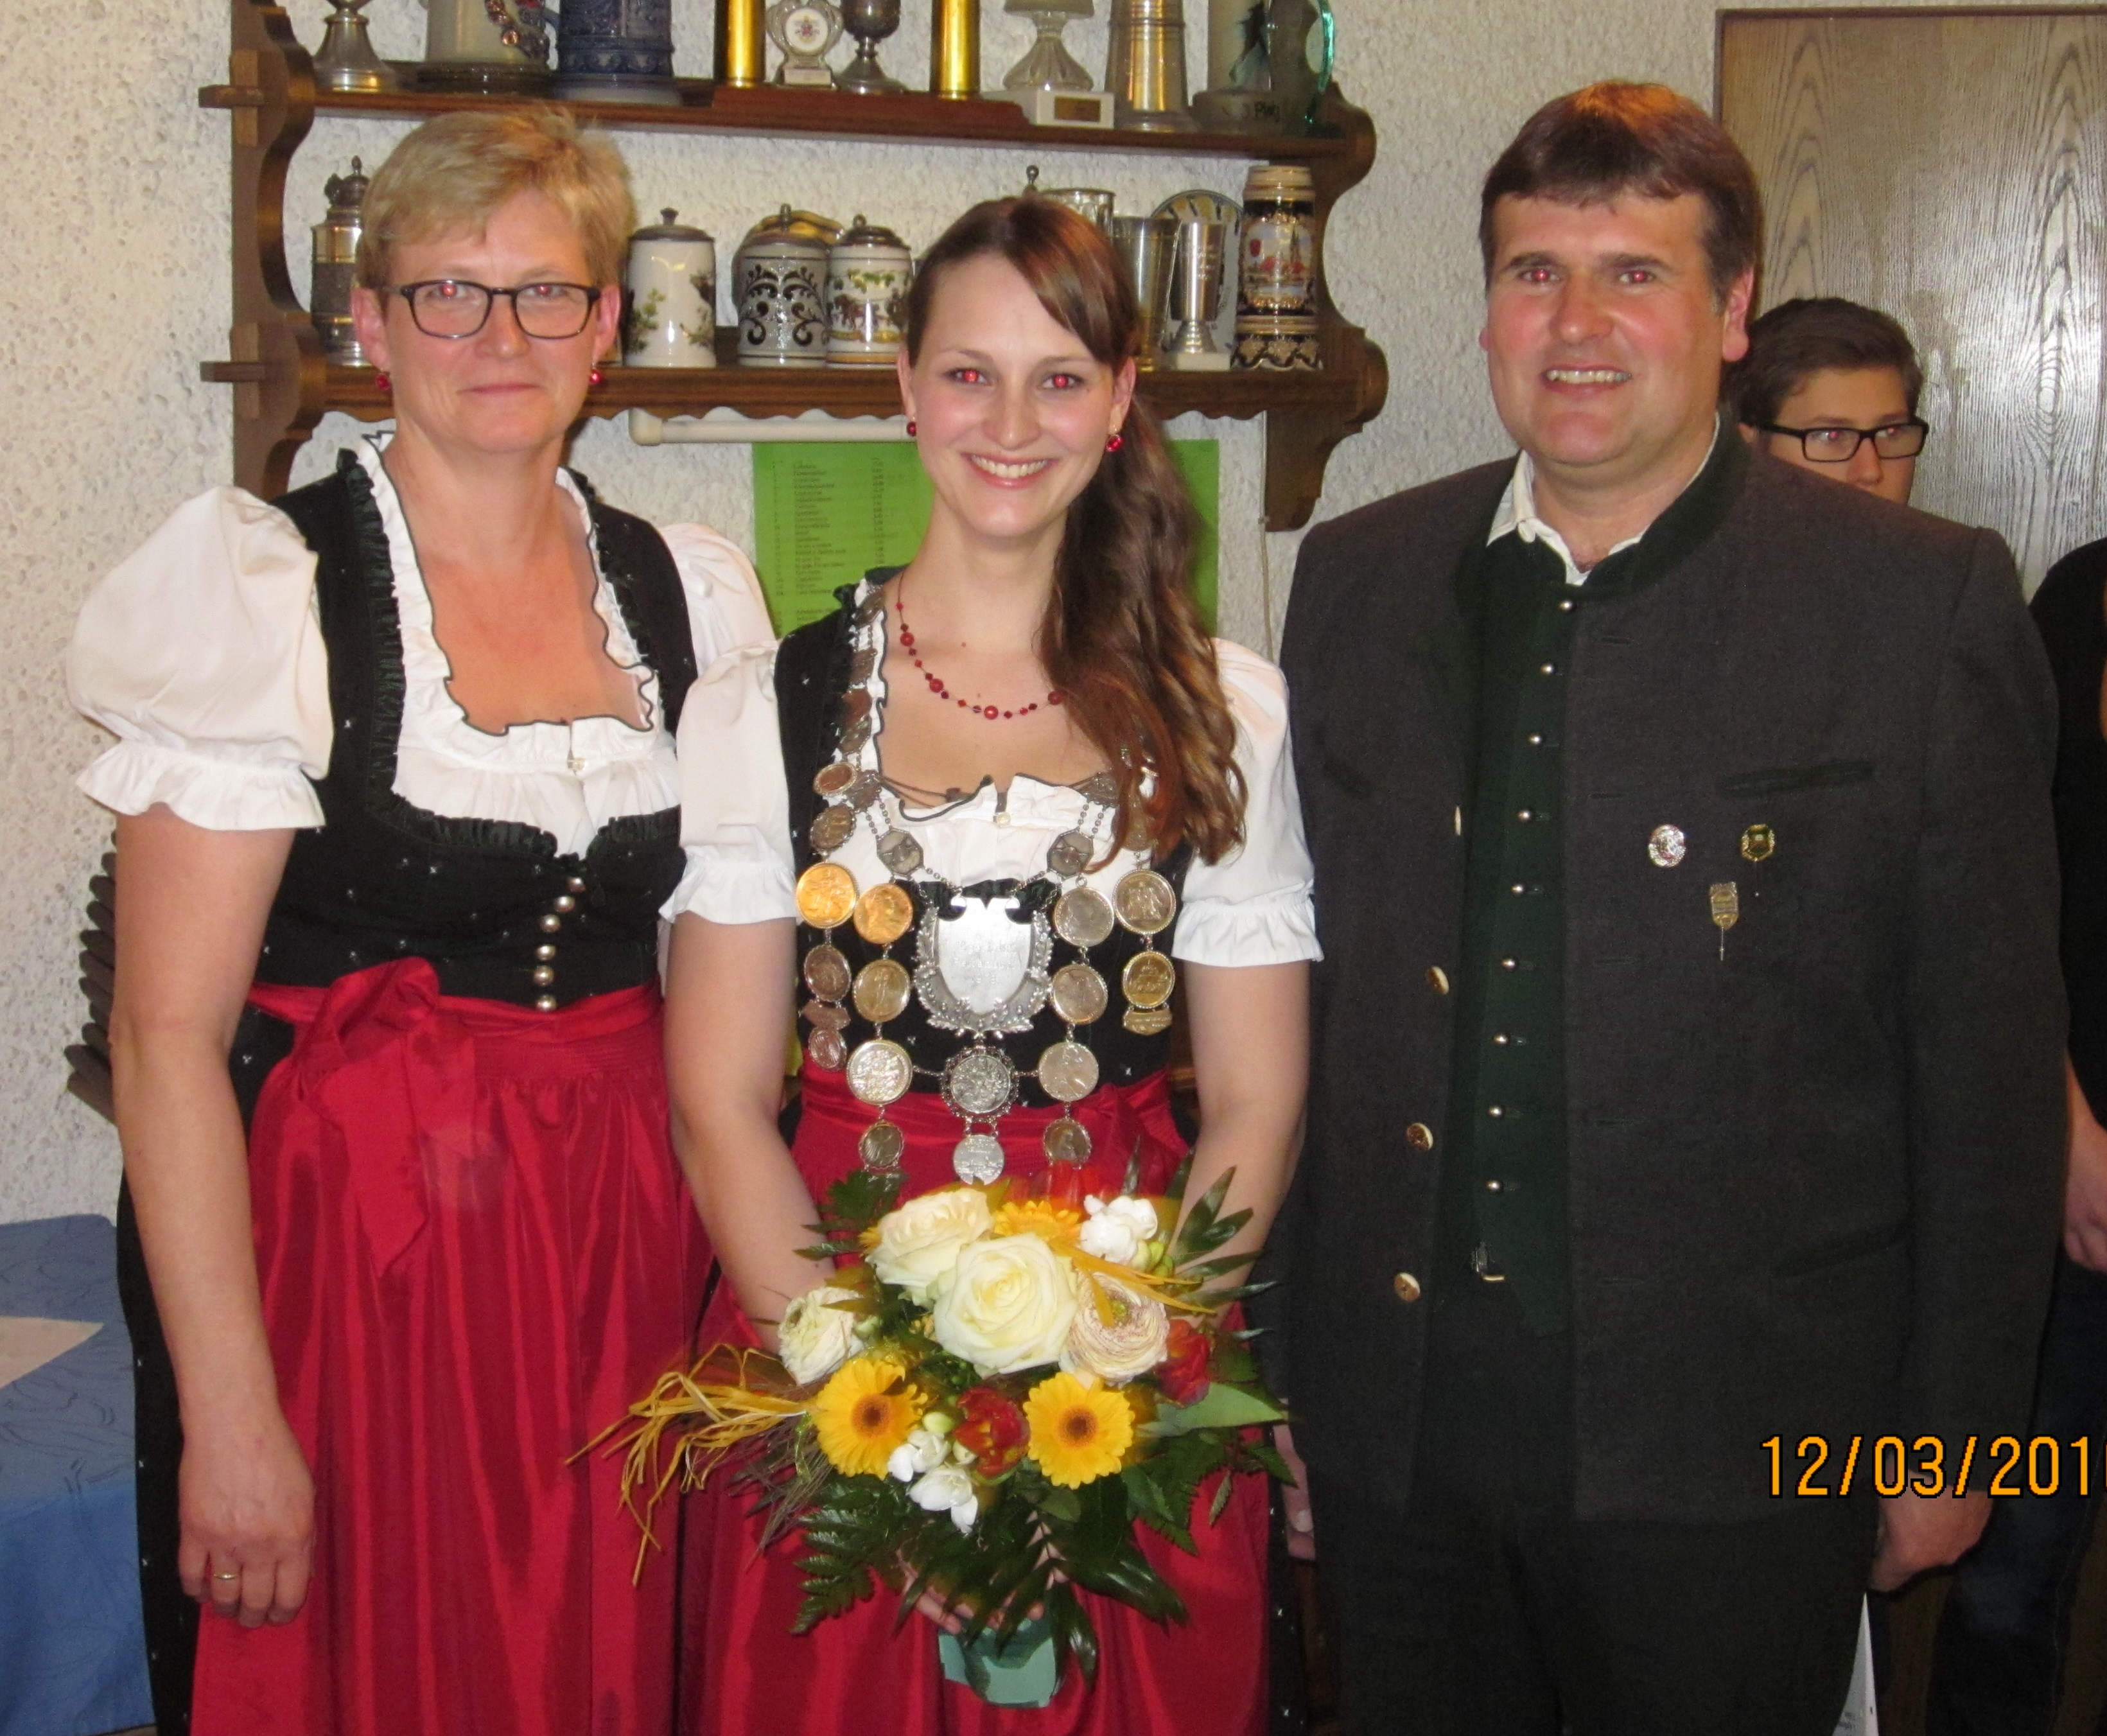 1. Liesl Sabrina Ertl